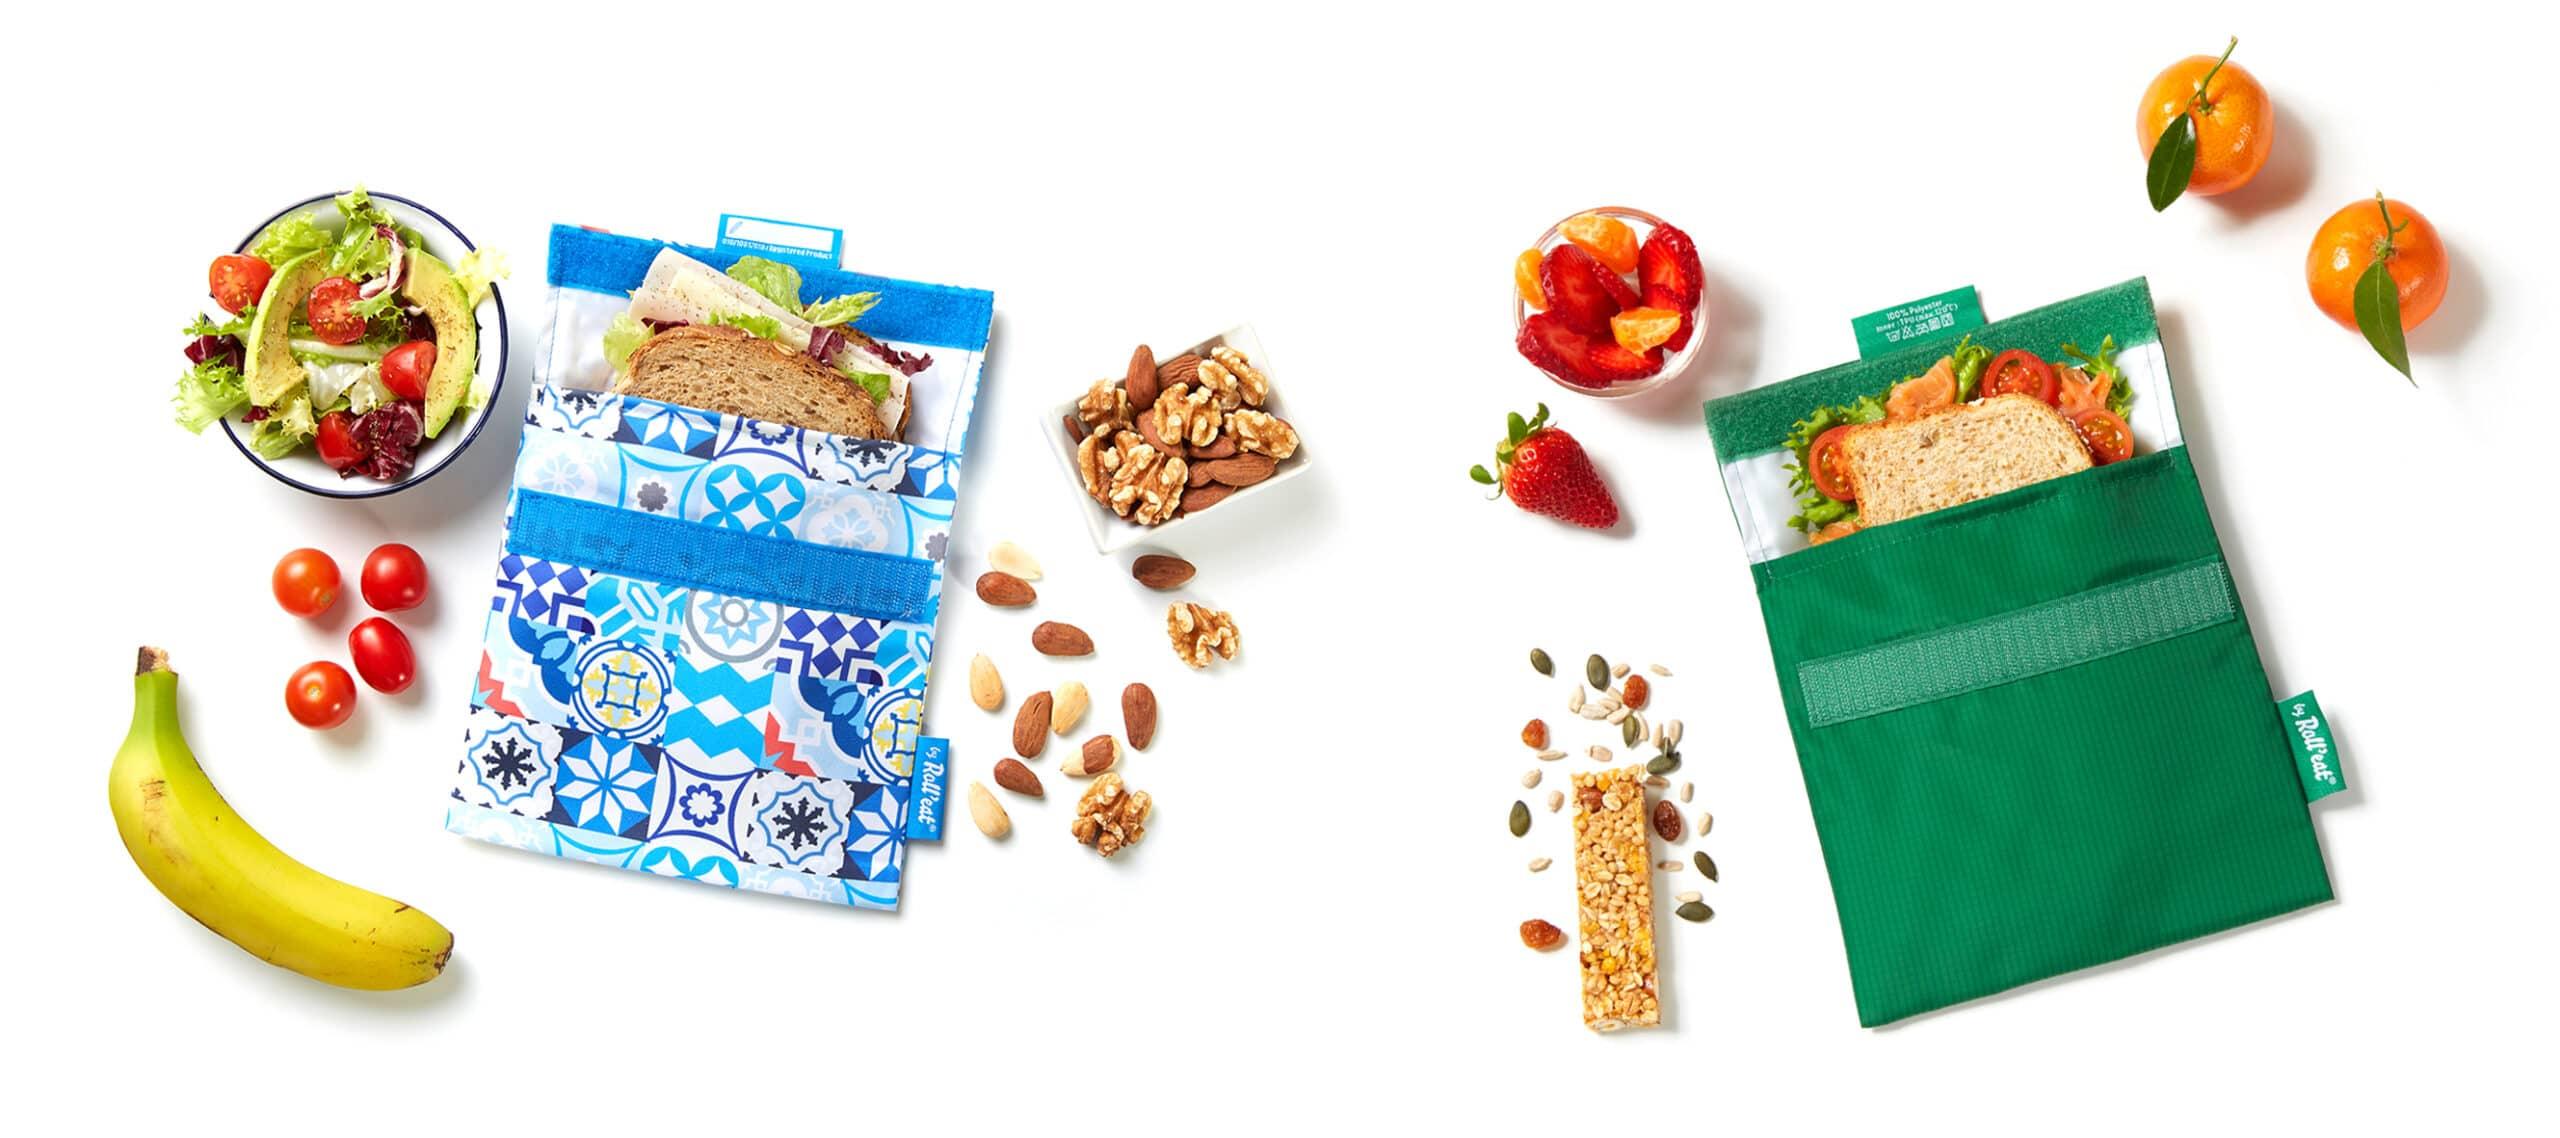 Porta snacks sostenible